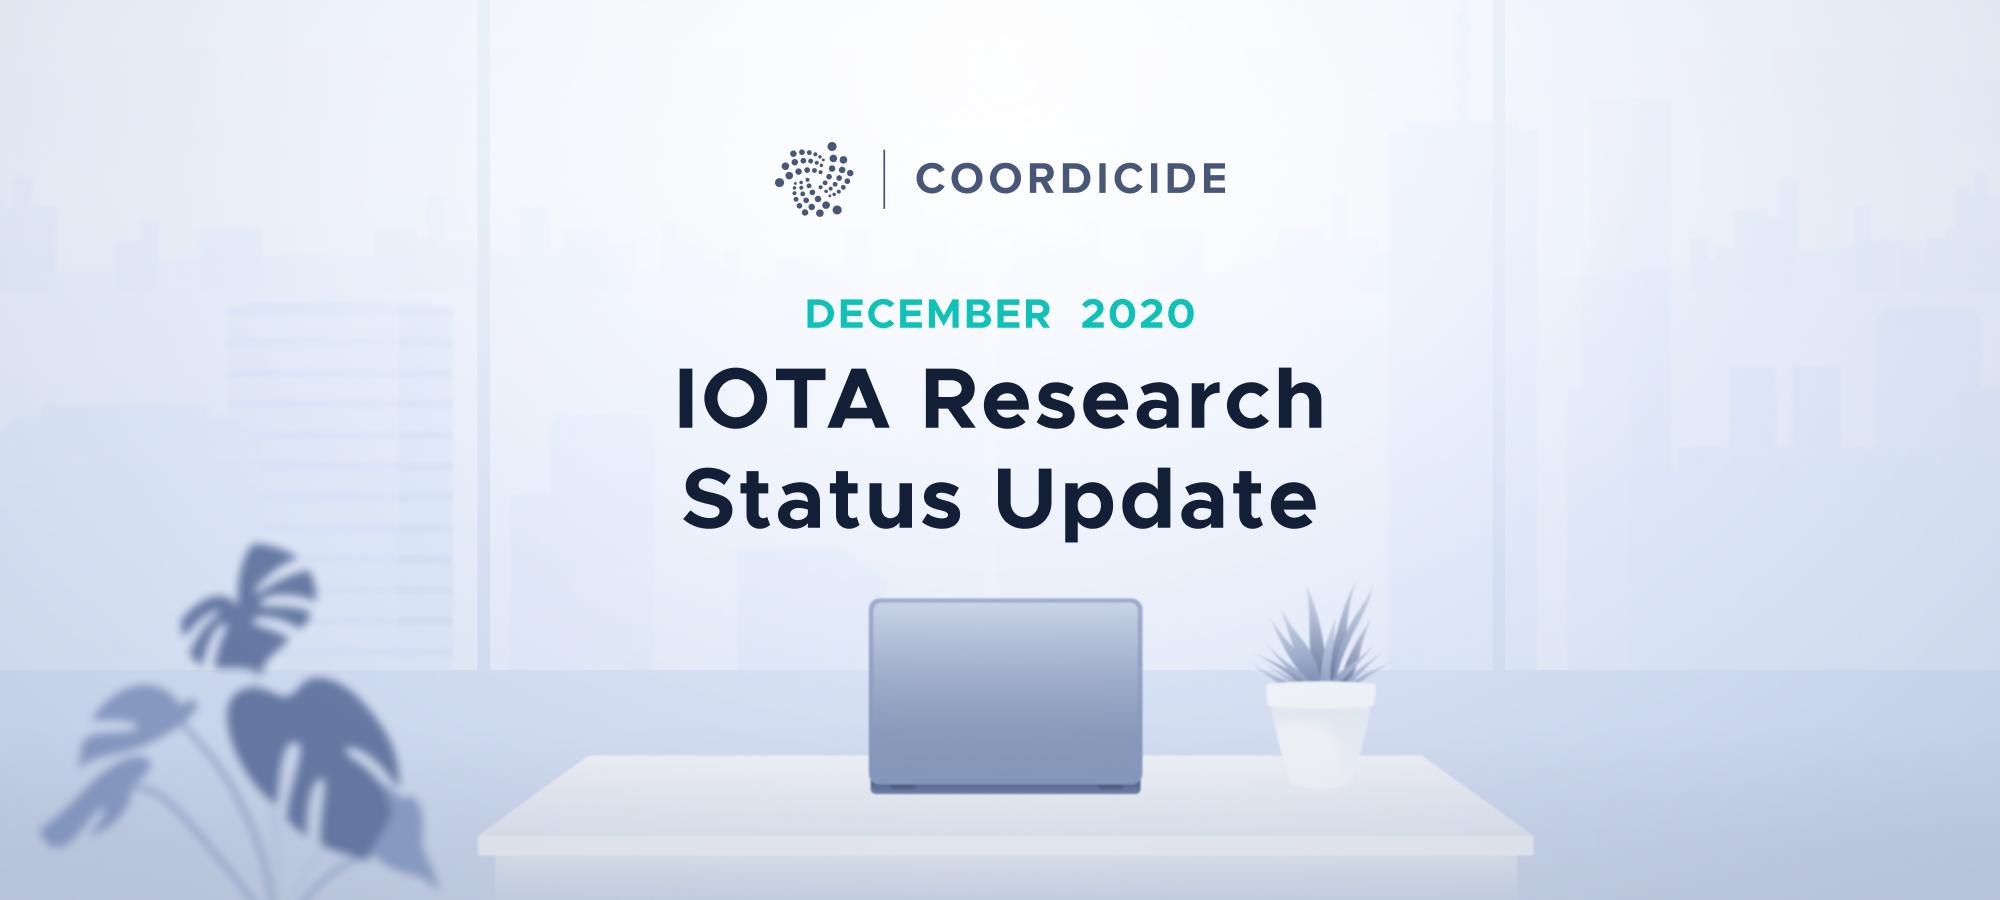 IOTA Research Status Update December 2020